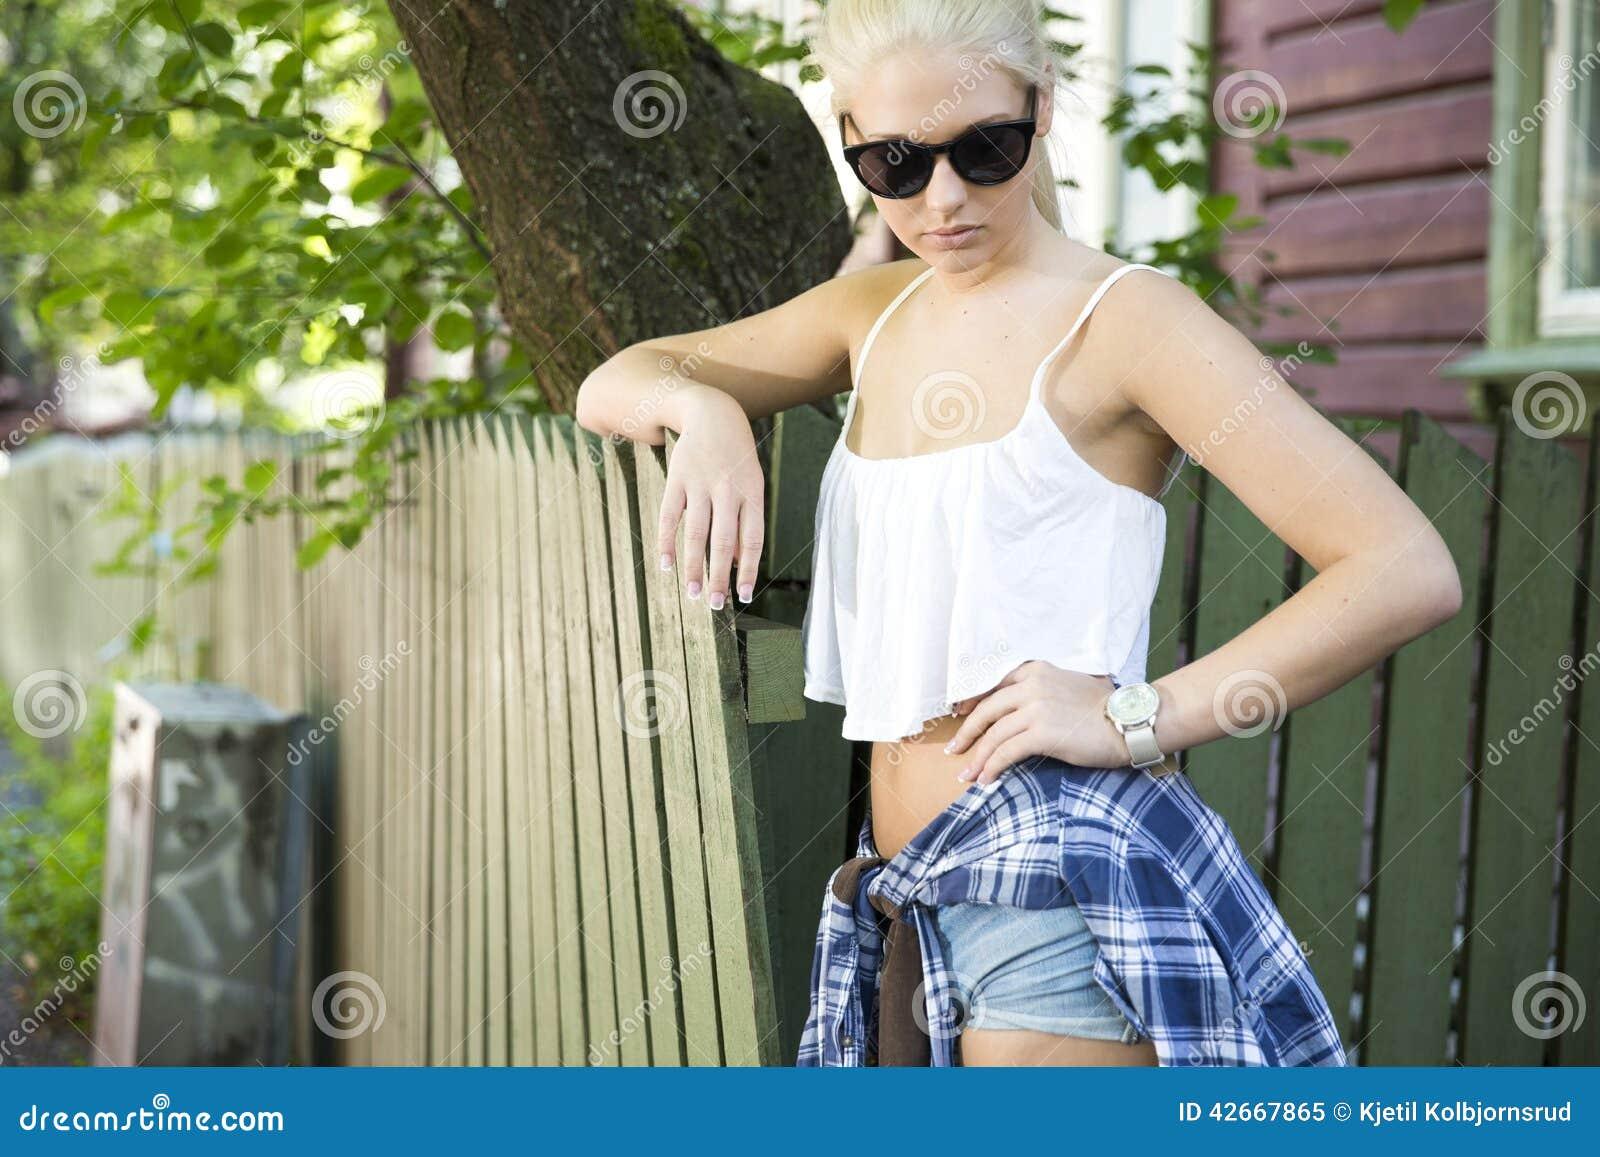 Blonde teen search full download, twink twerking